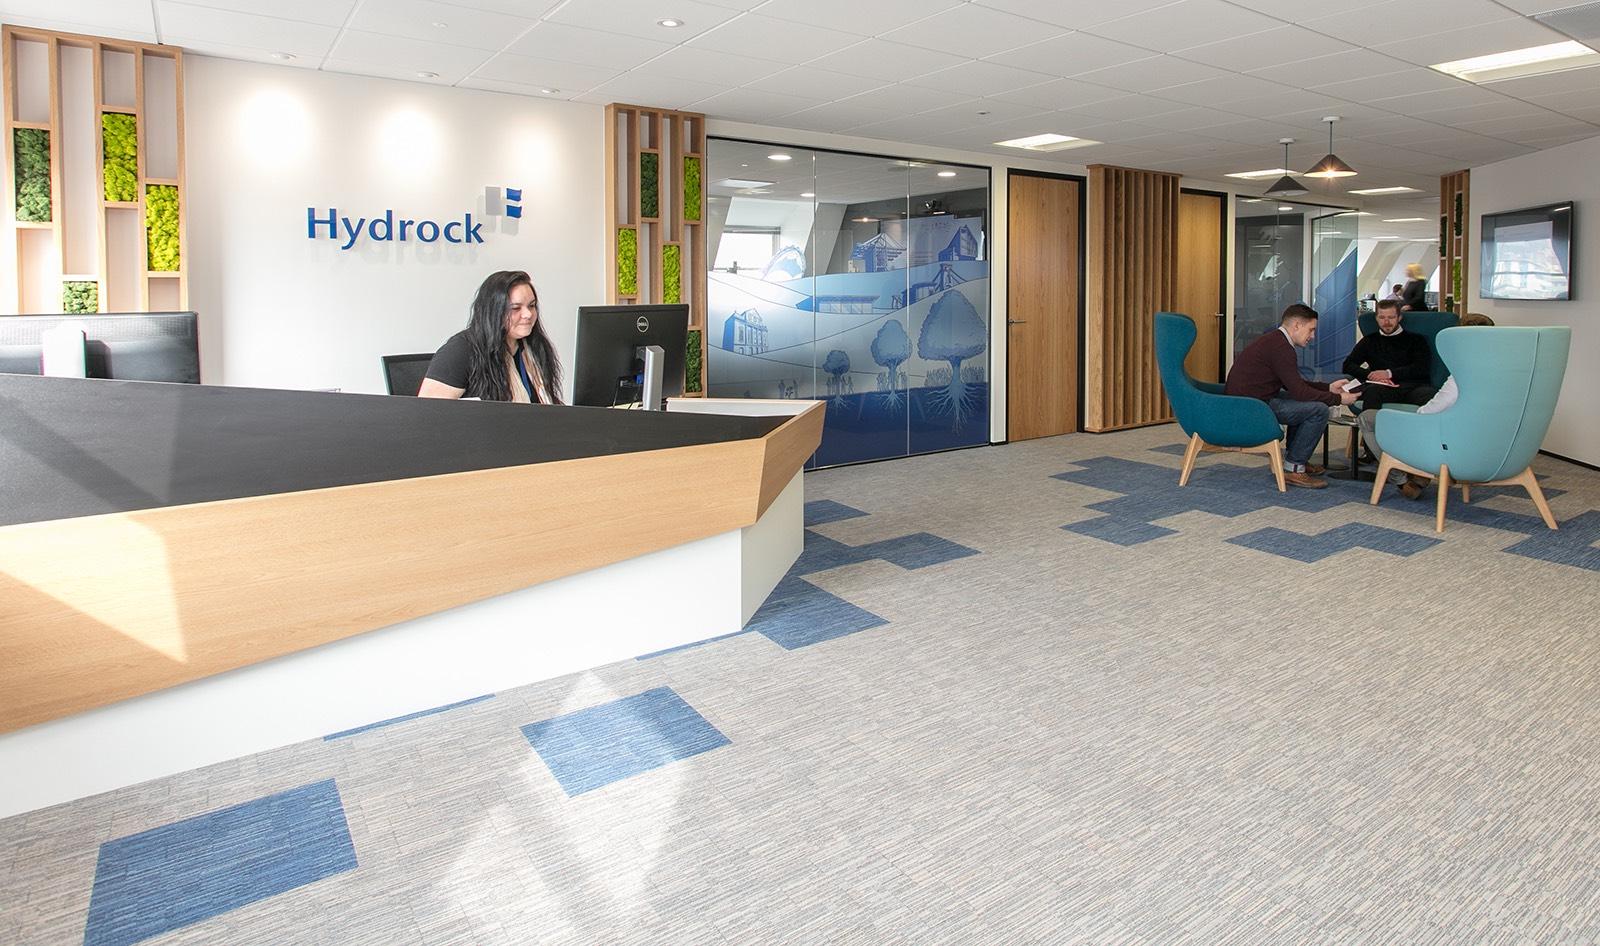 hydrock-bristol-office-3